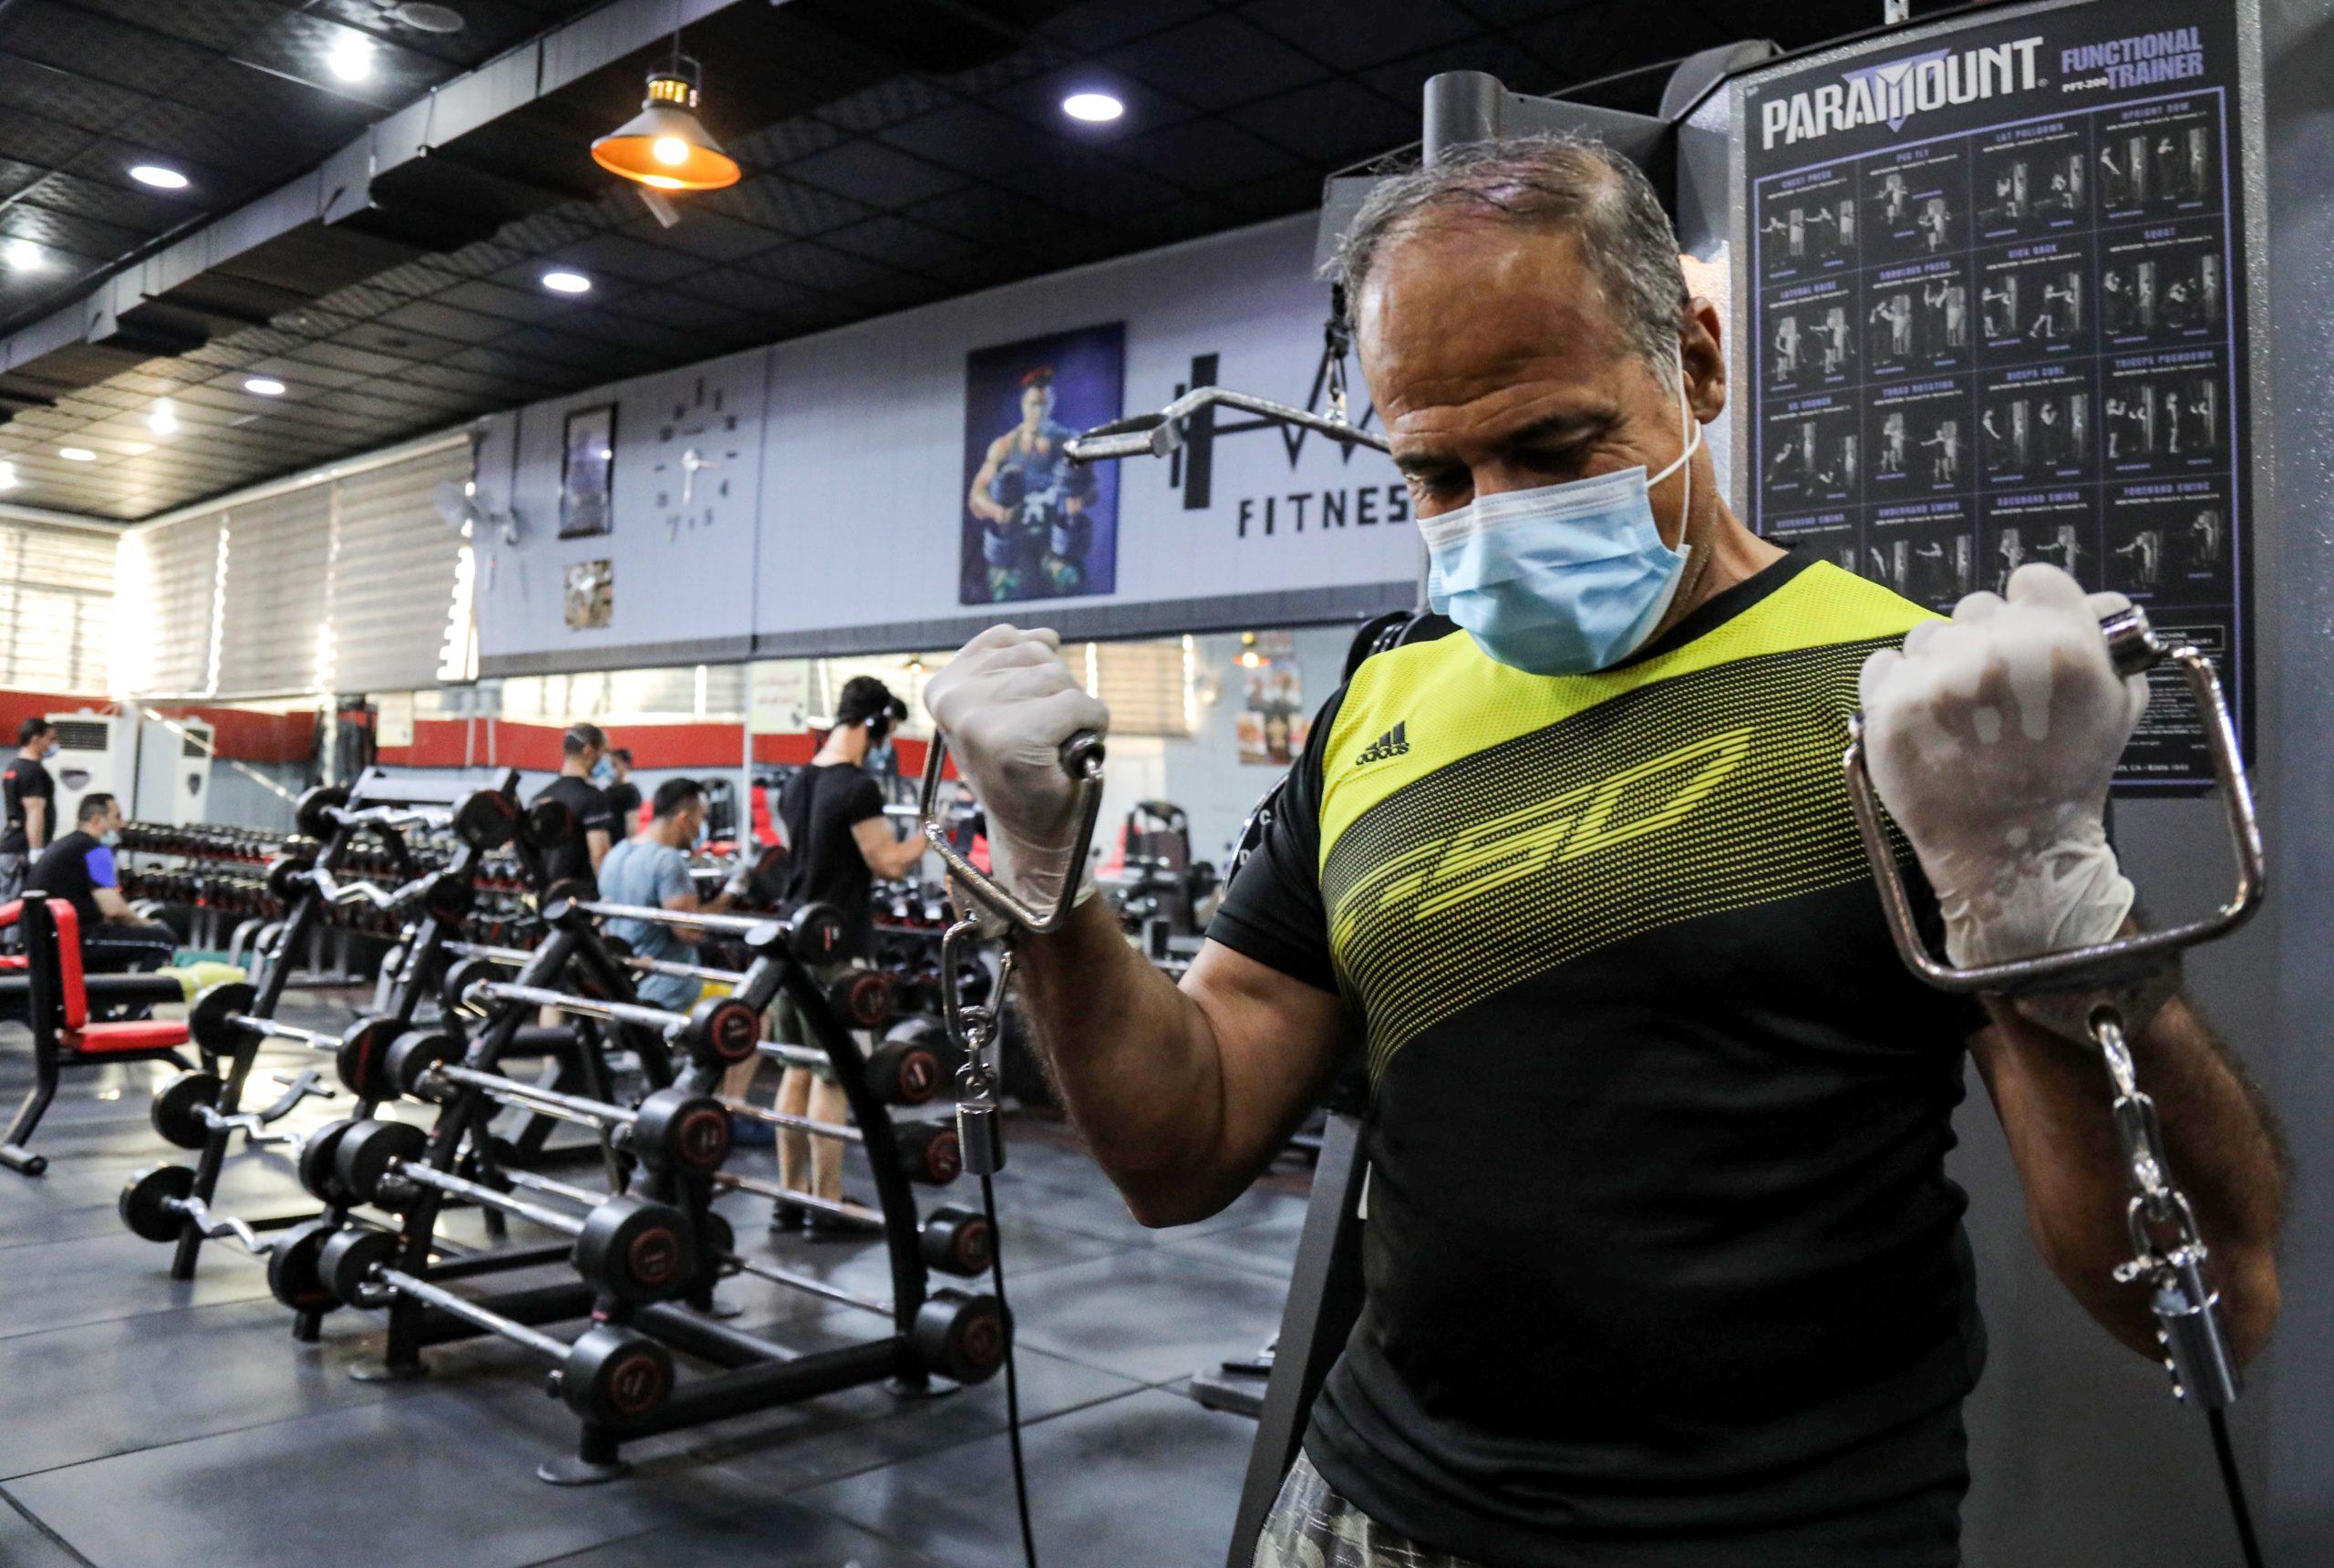 IRAQ-KURDS-HEALTH-VIRUS-SPORT-FITNESS